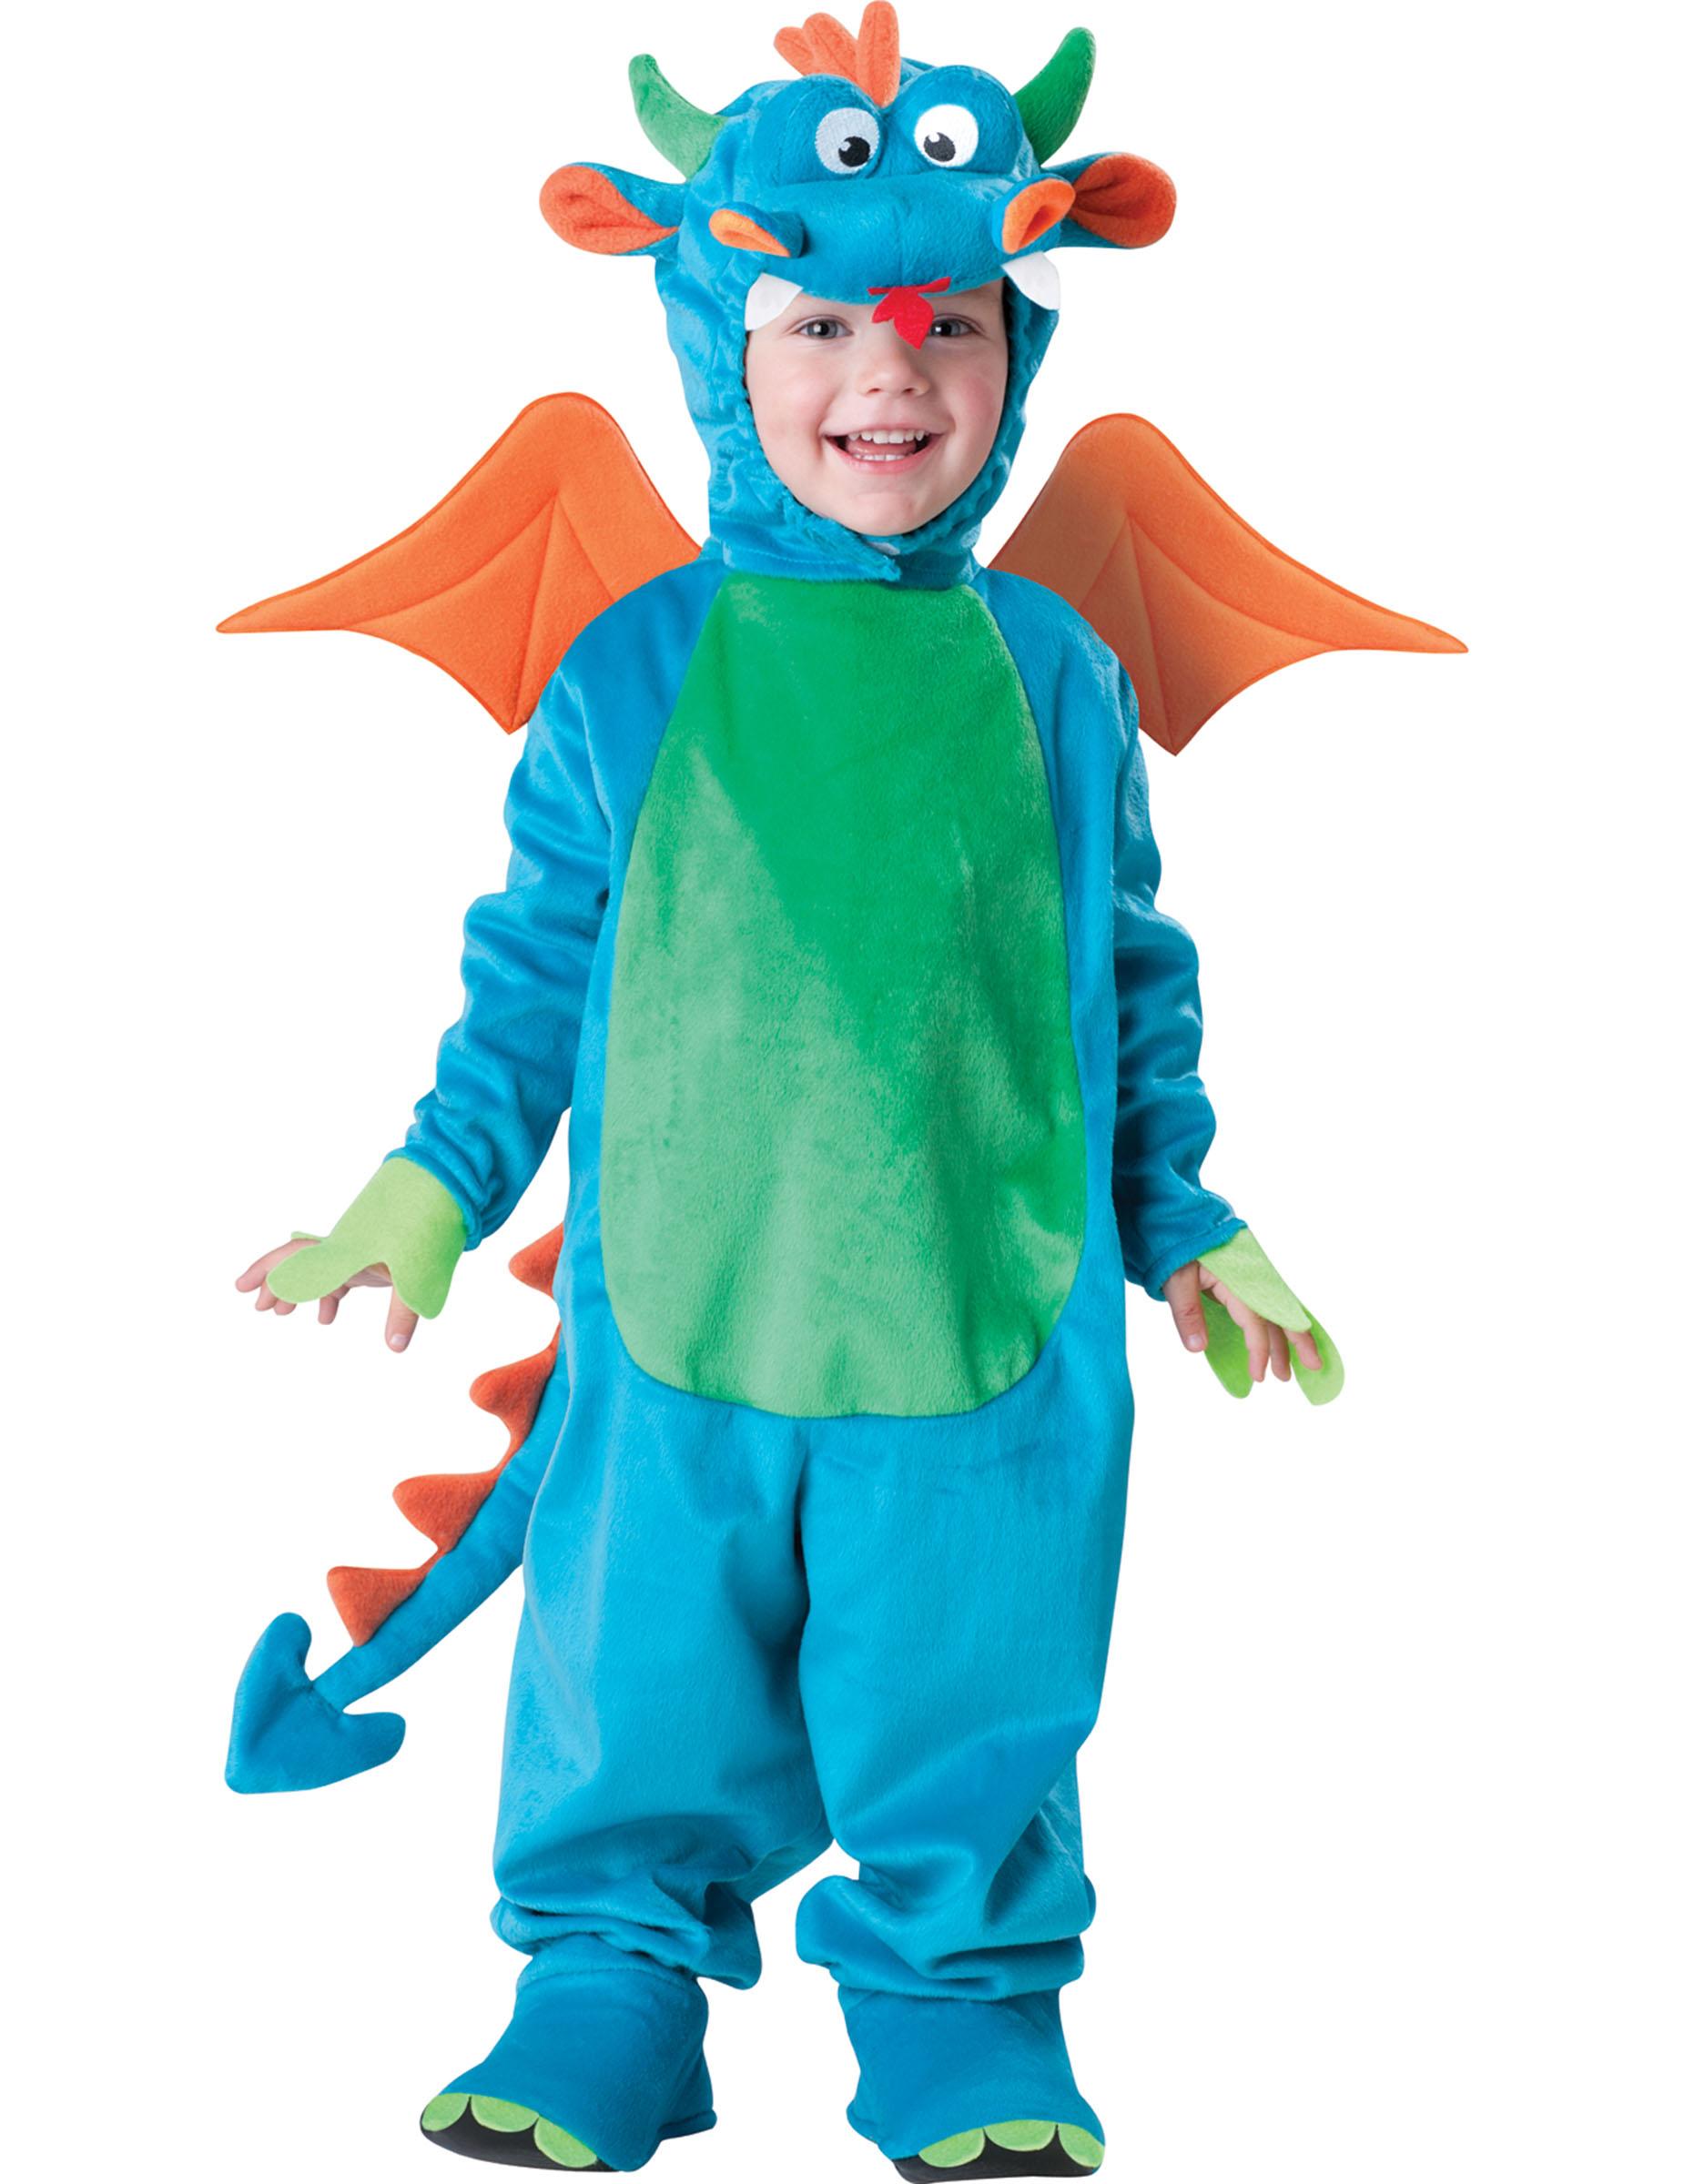 Kostum Drache Fur Kinder Bunt Gunstige Faschings Kostume Bei